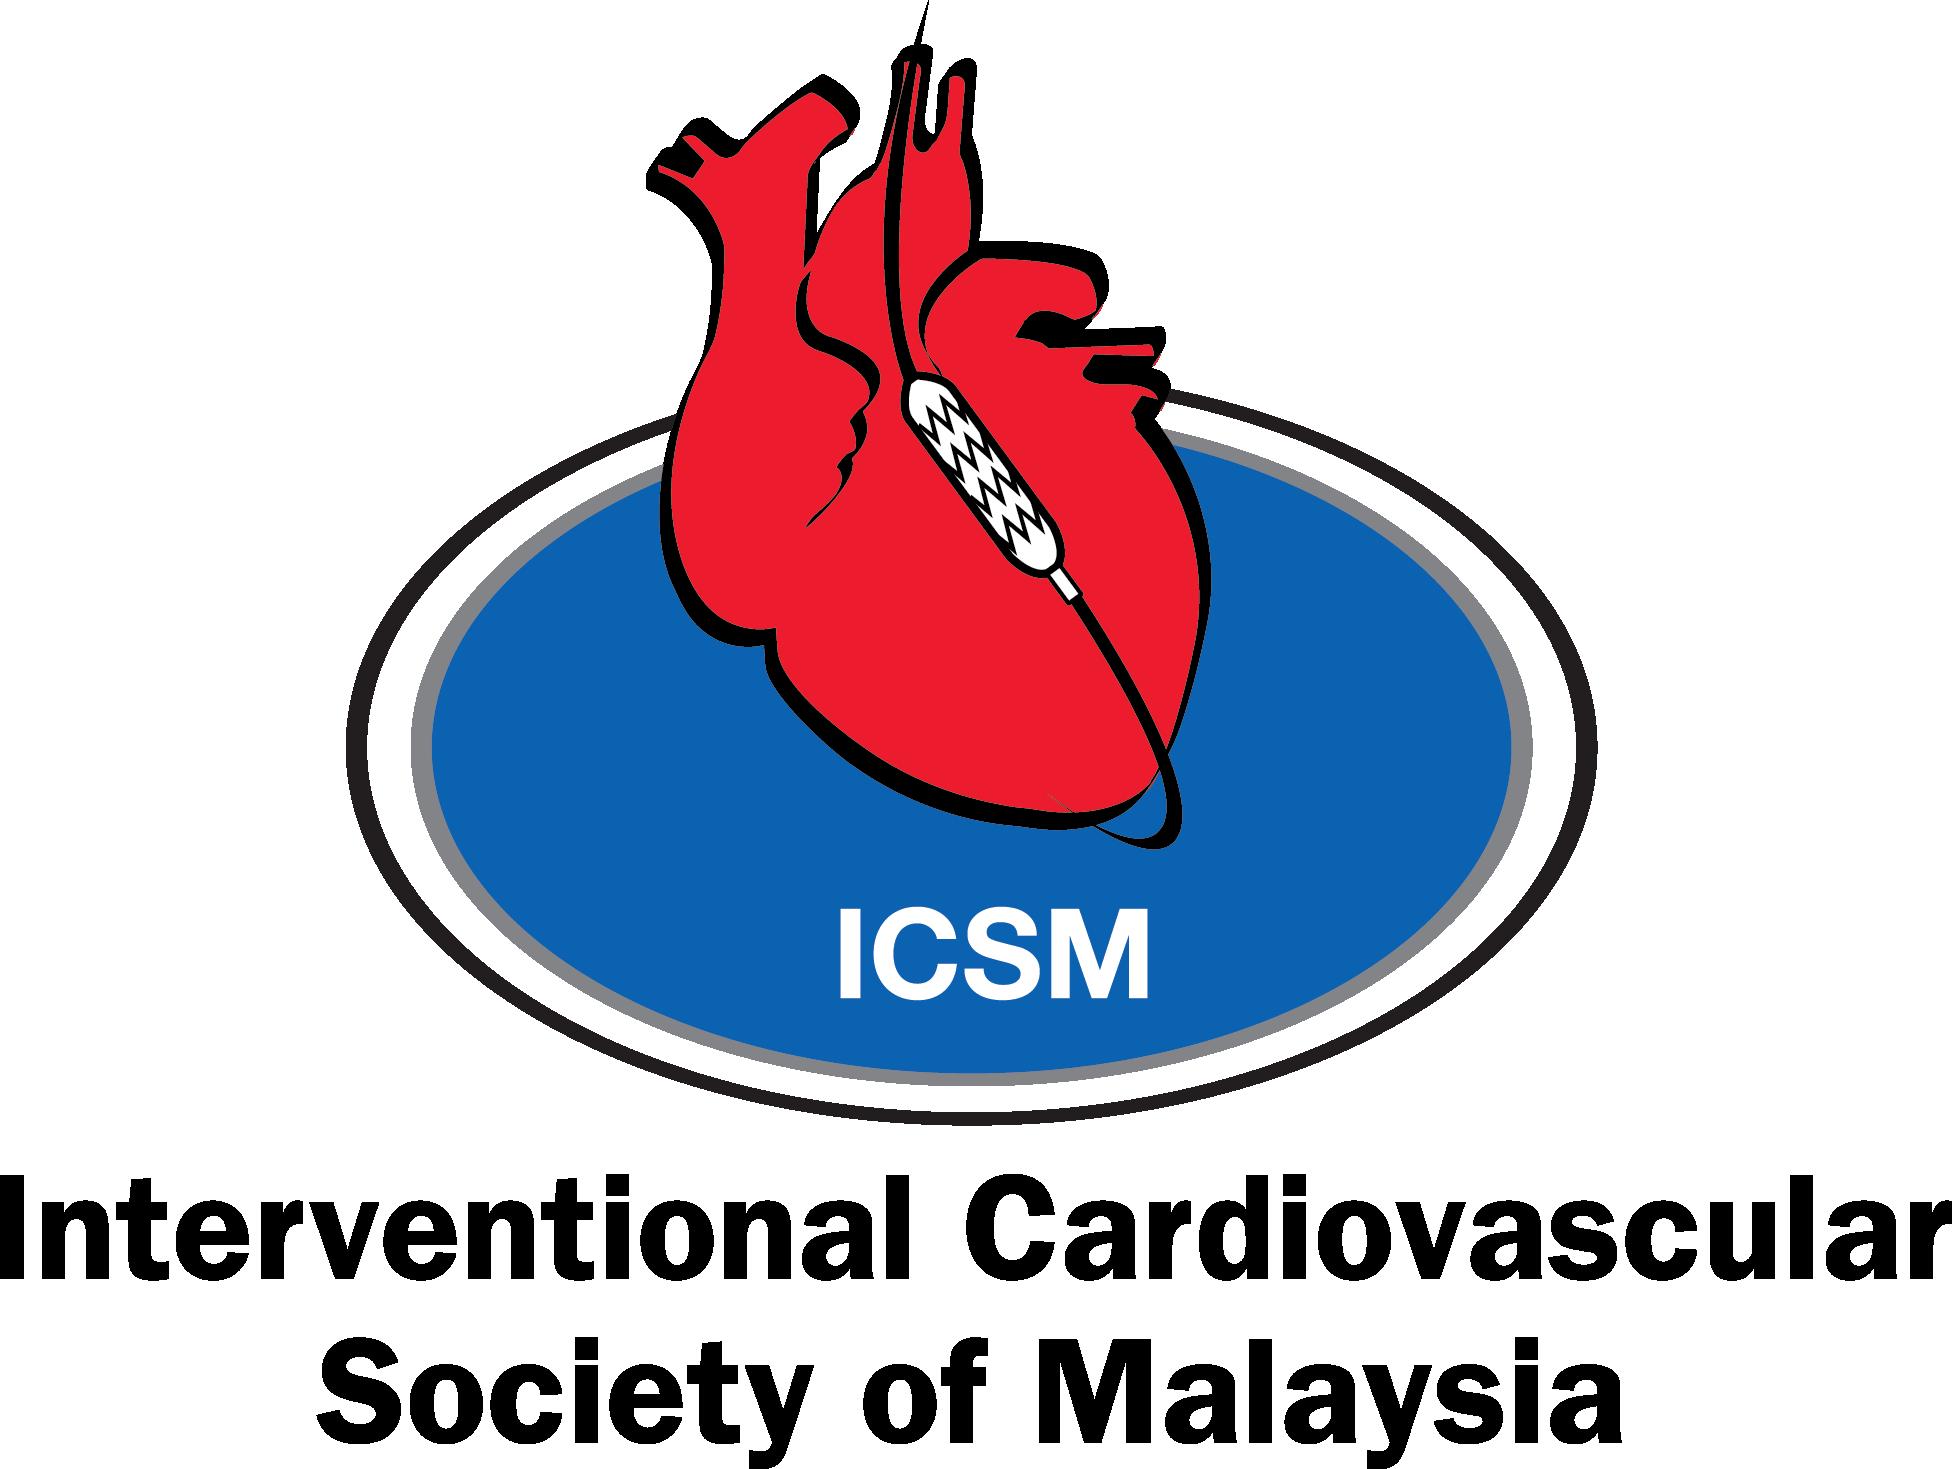 ICSM logo (Final)- SingLIVE